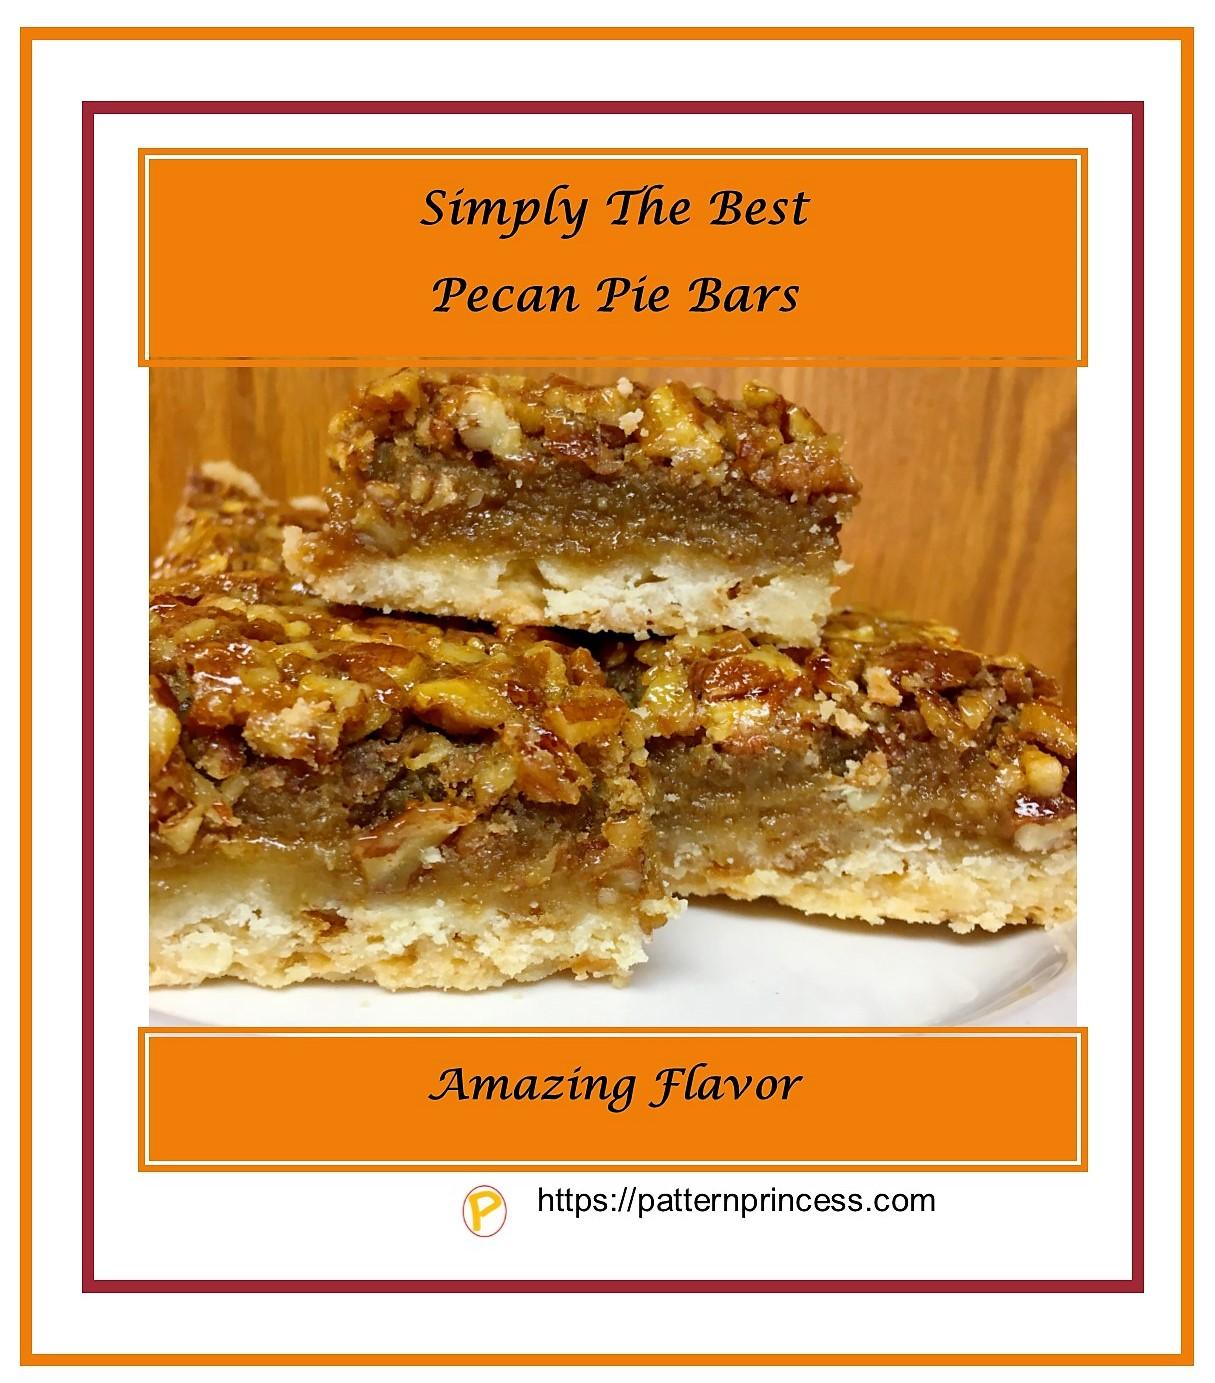 Simply The Best Pecan Pie Bars 1